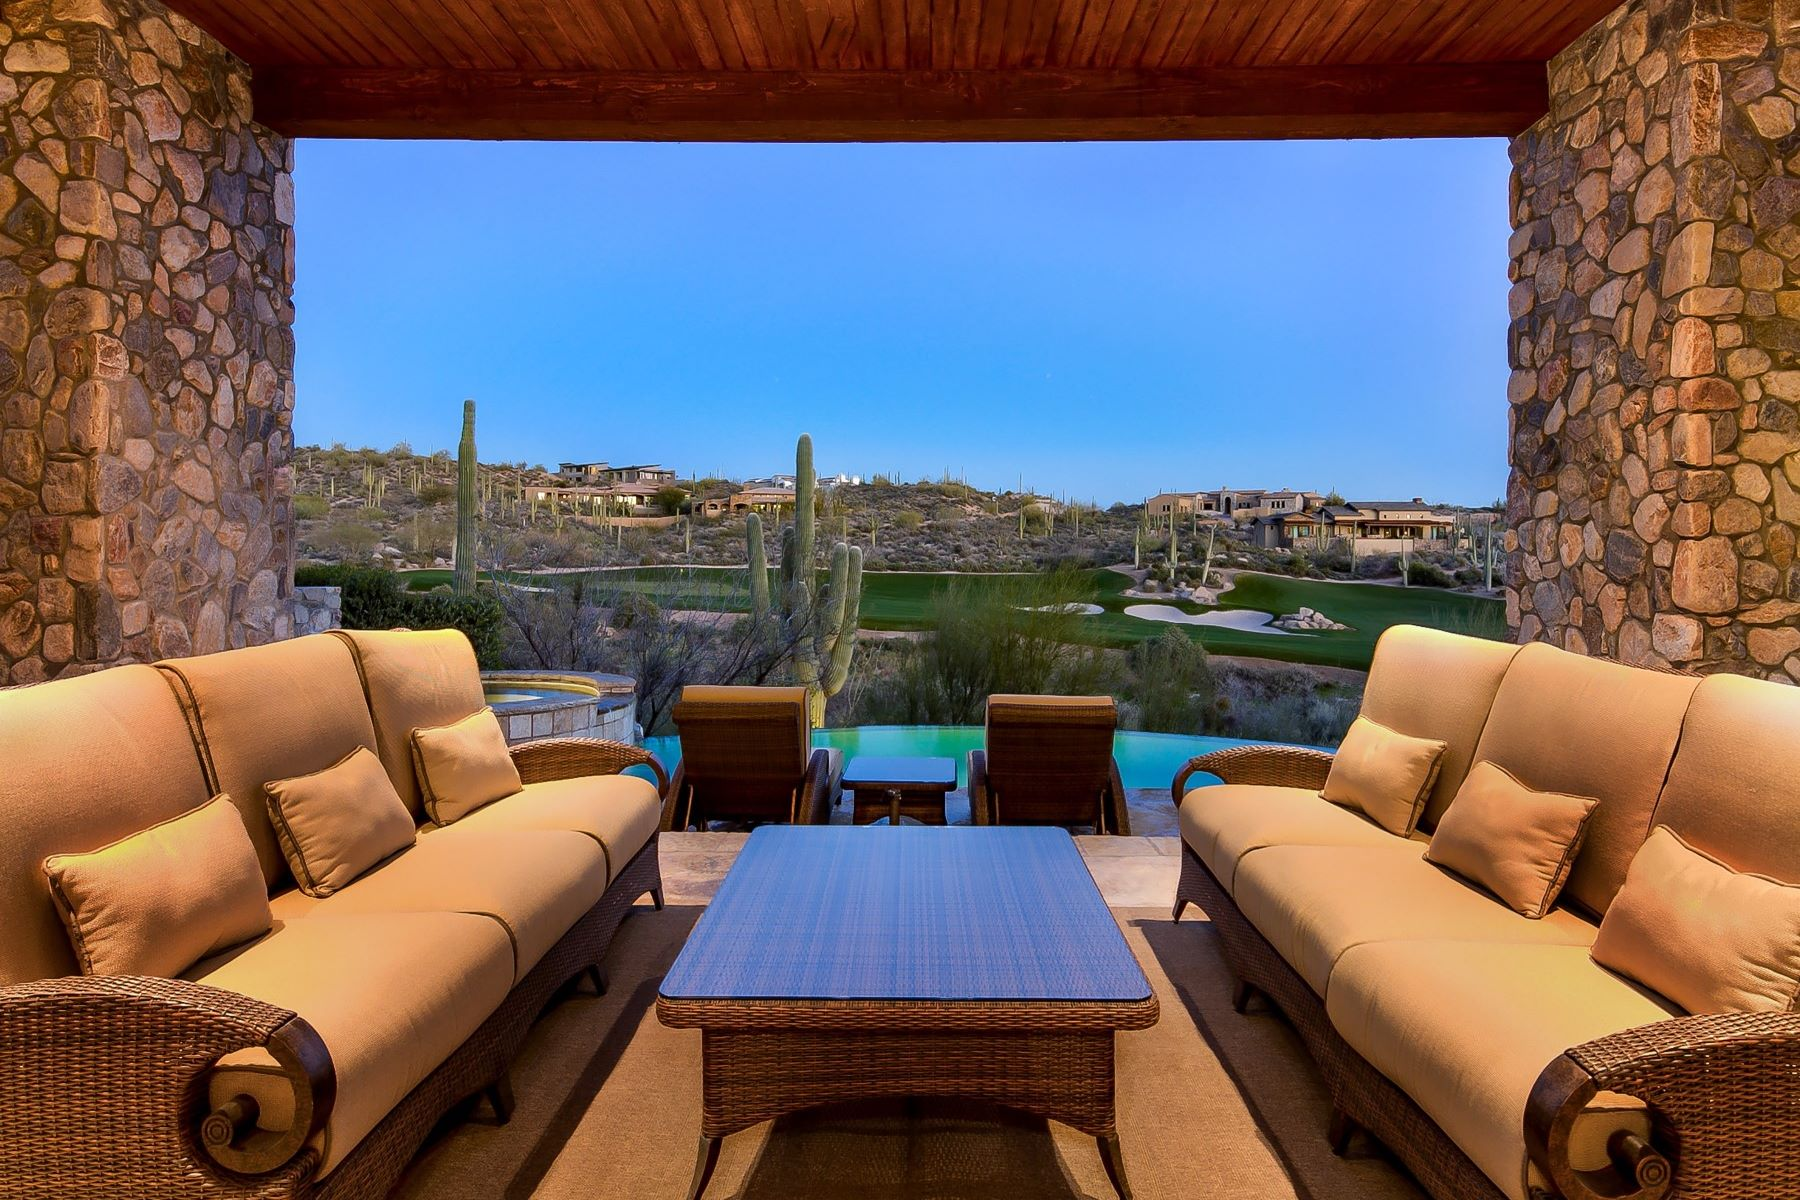 واحد منزل الأسرة للـ Sale في Incredible Home with Breathtaking Views 41445 N 95TH ST, Scottsdale, Arizona, 85262 United States